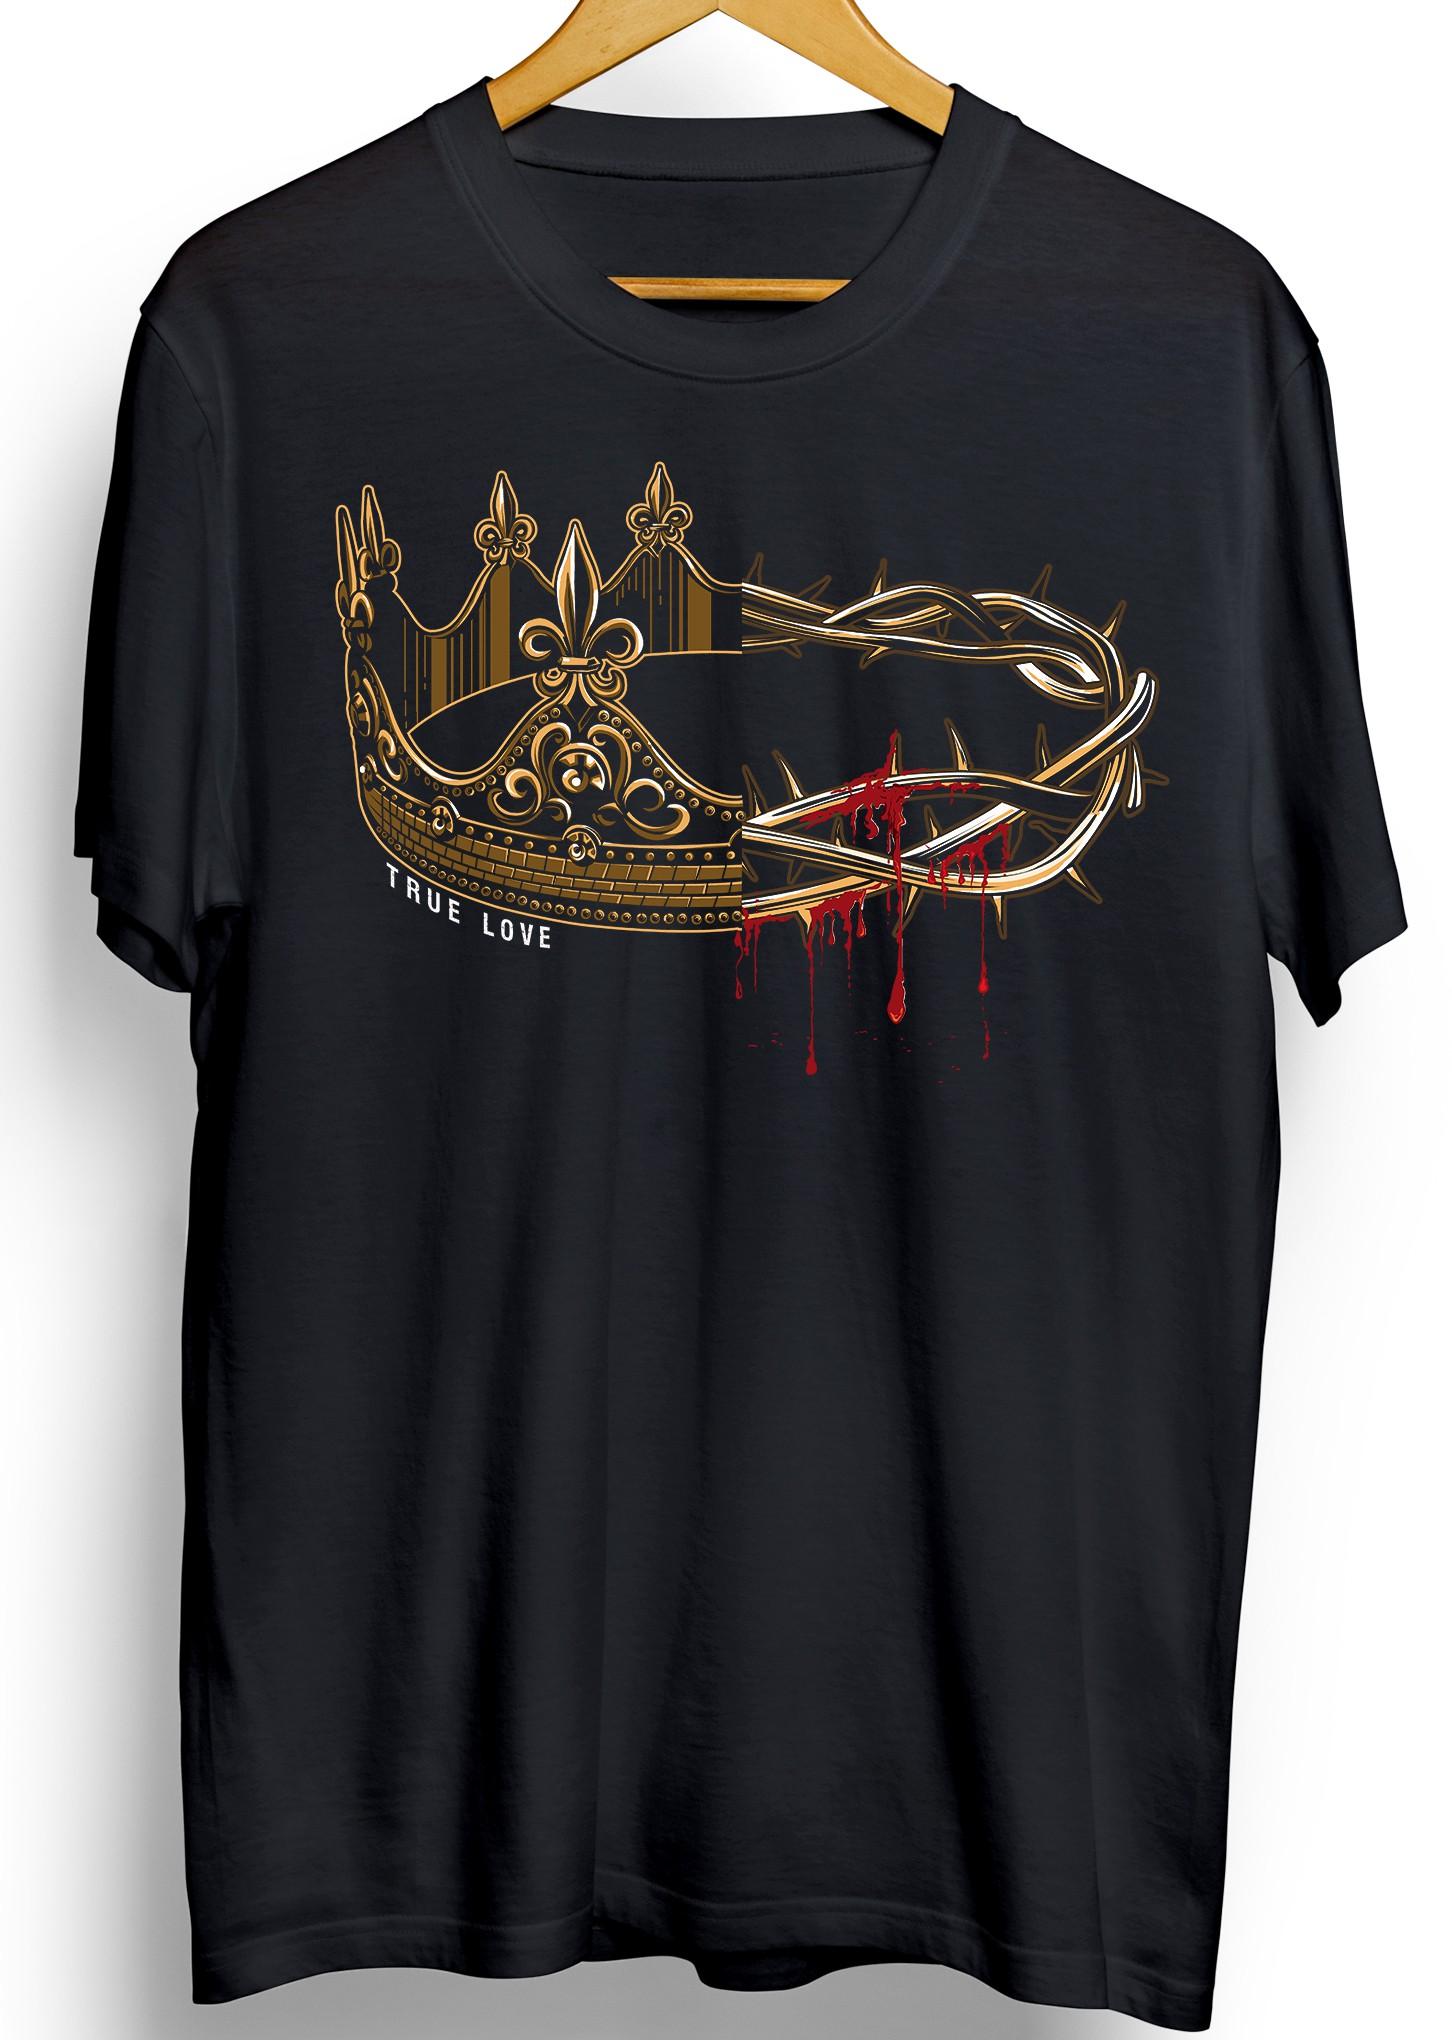 True Love Christian Shirt Design